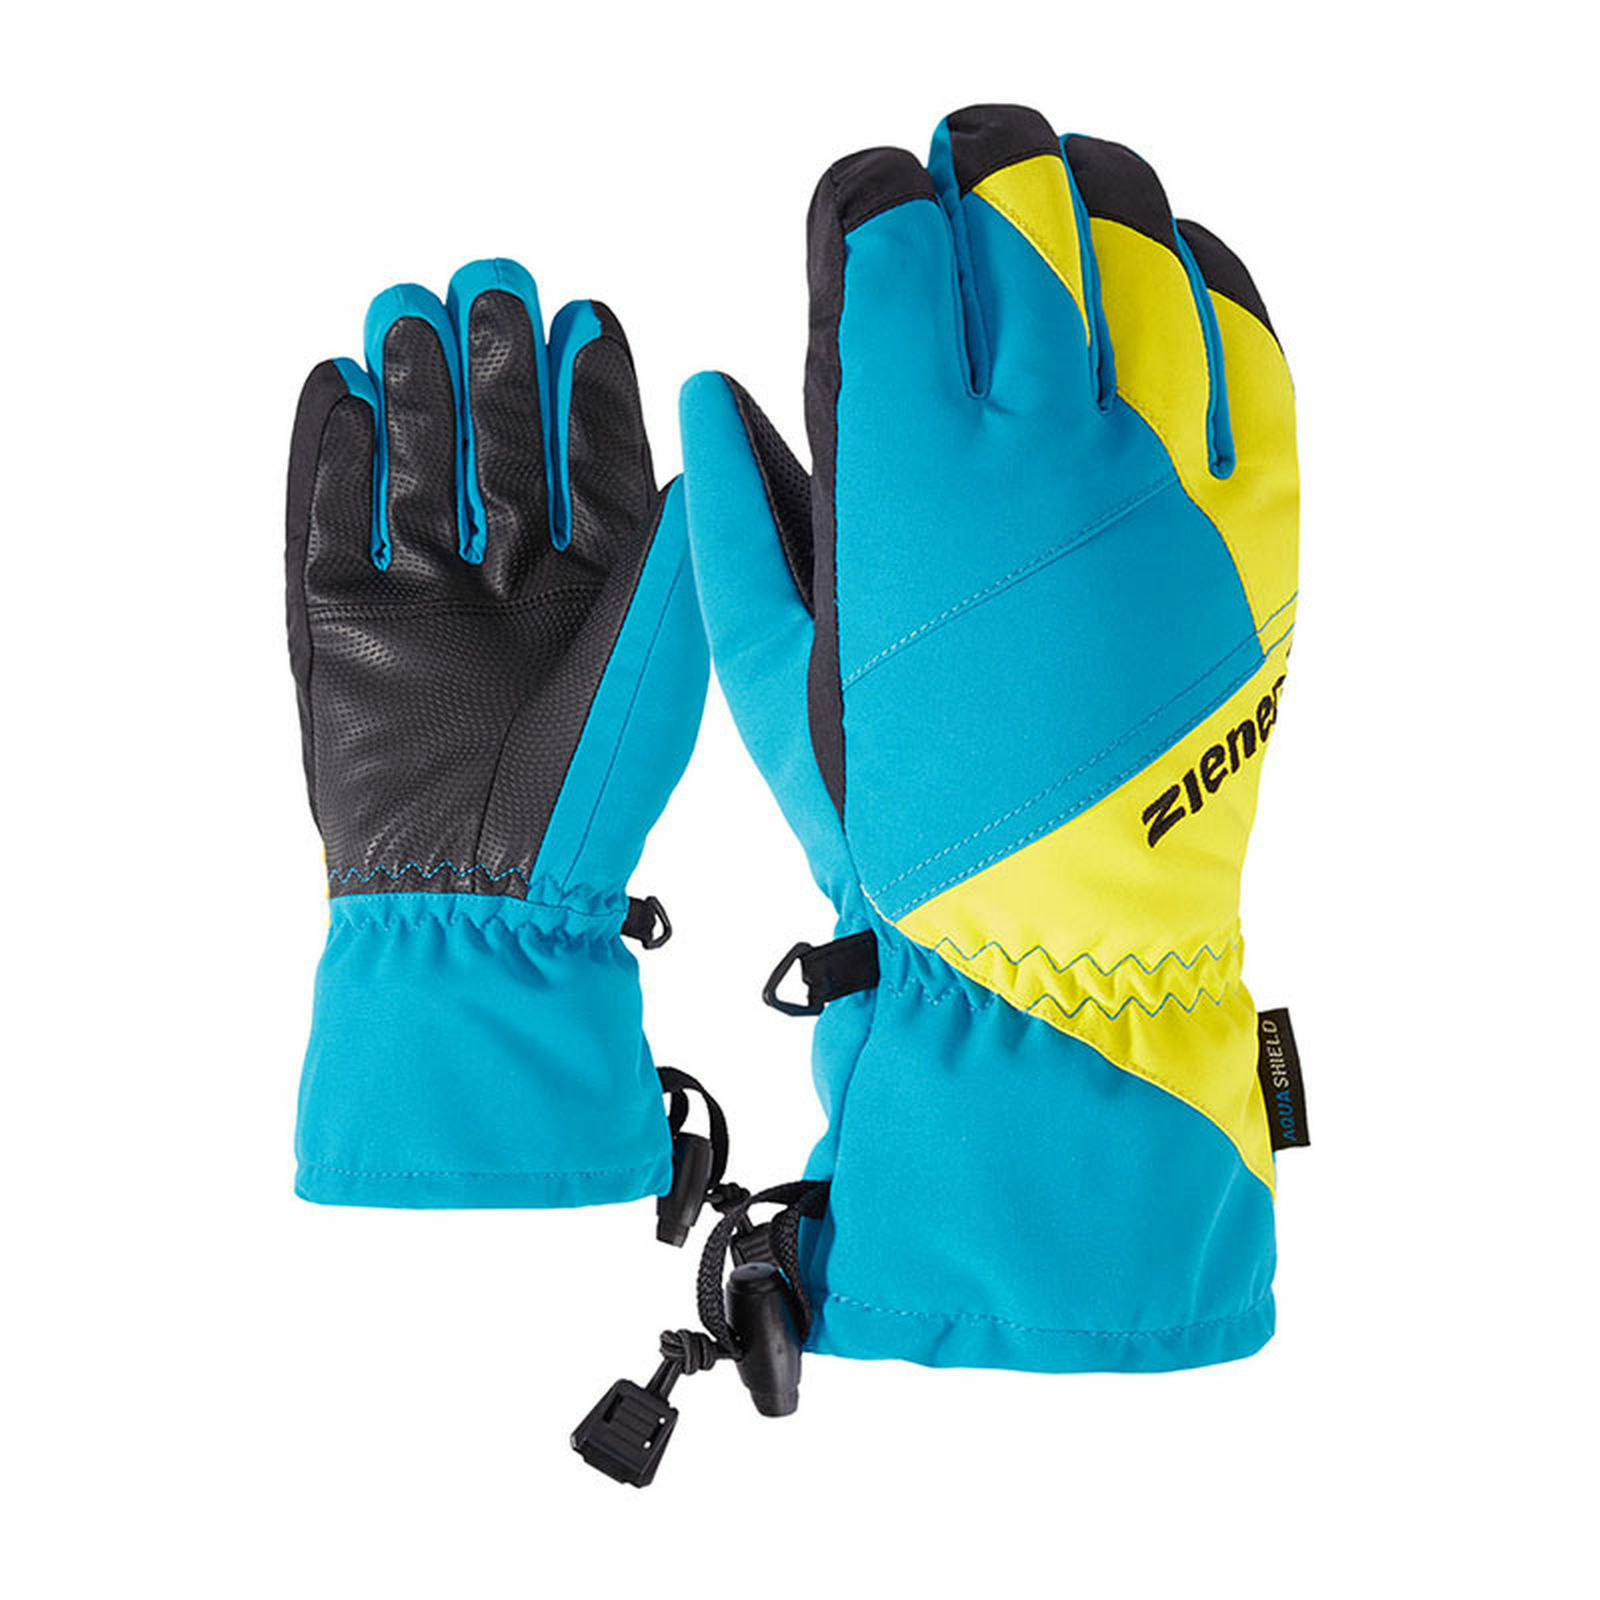 Ziener Kinder Skihandschuhe Fingerhandschuhe AGIL AS  blue   green 801905 113413